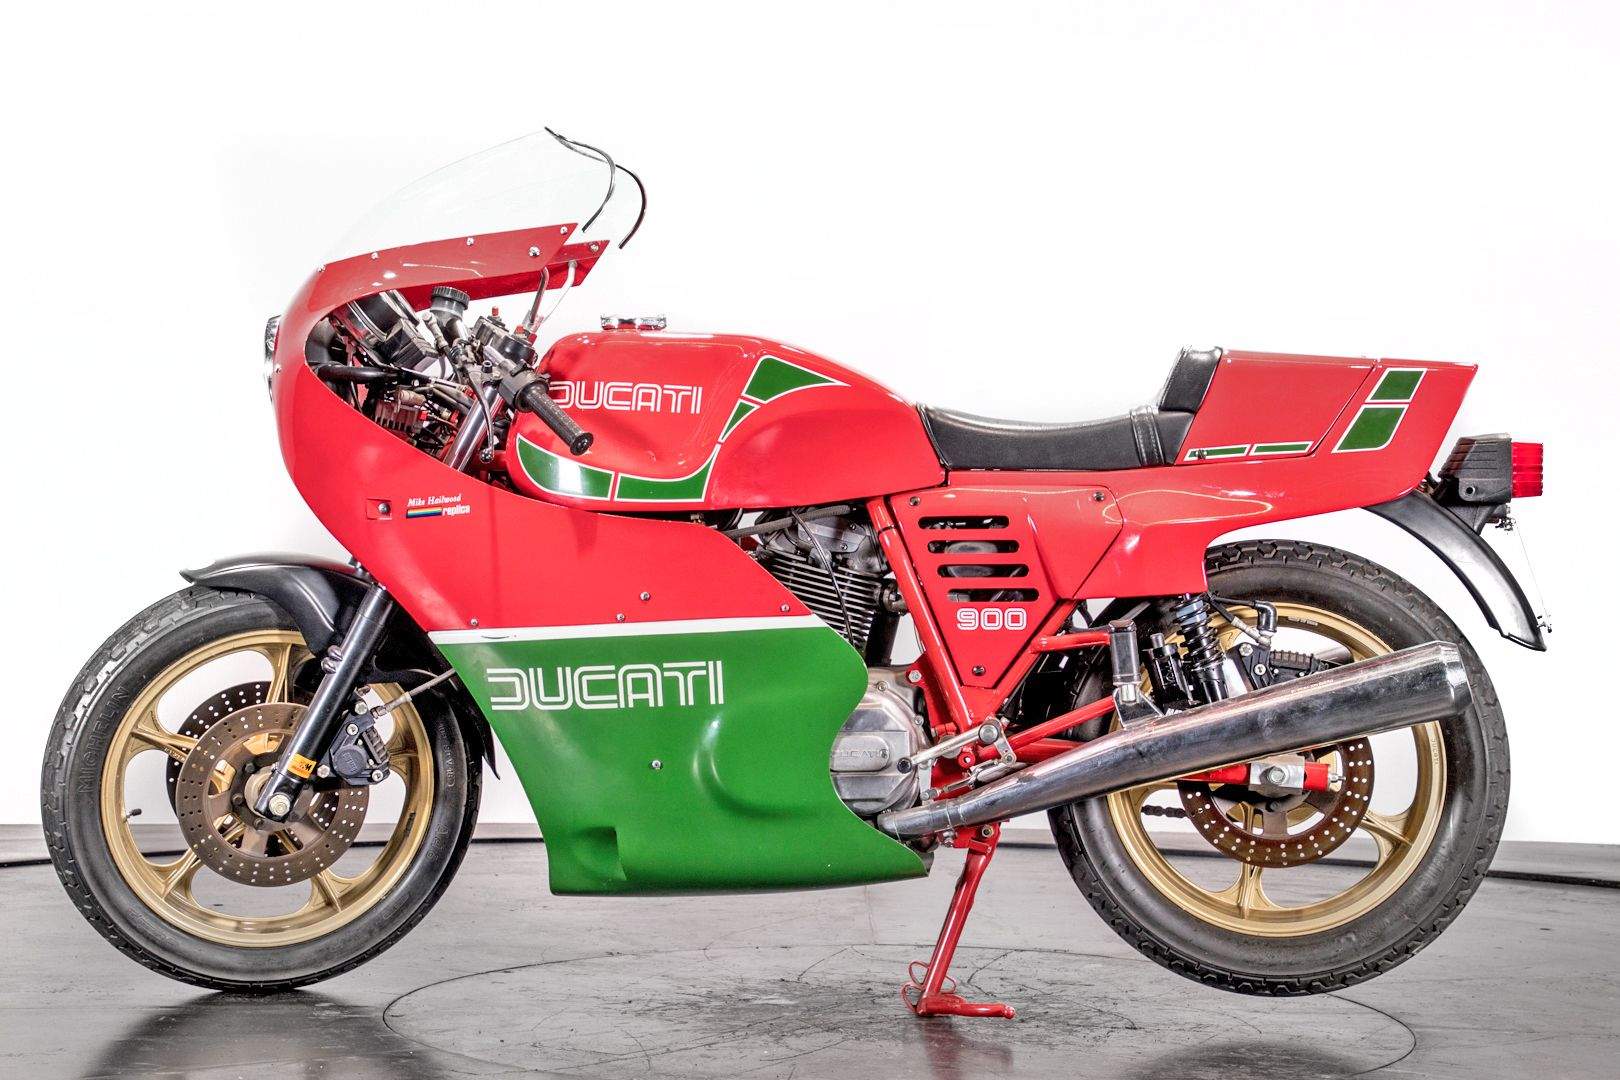 1984 Ducati 900 Mike Hailwood Replica 81548